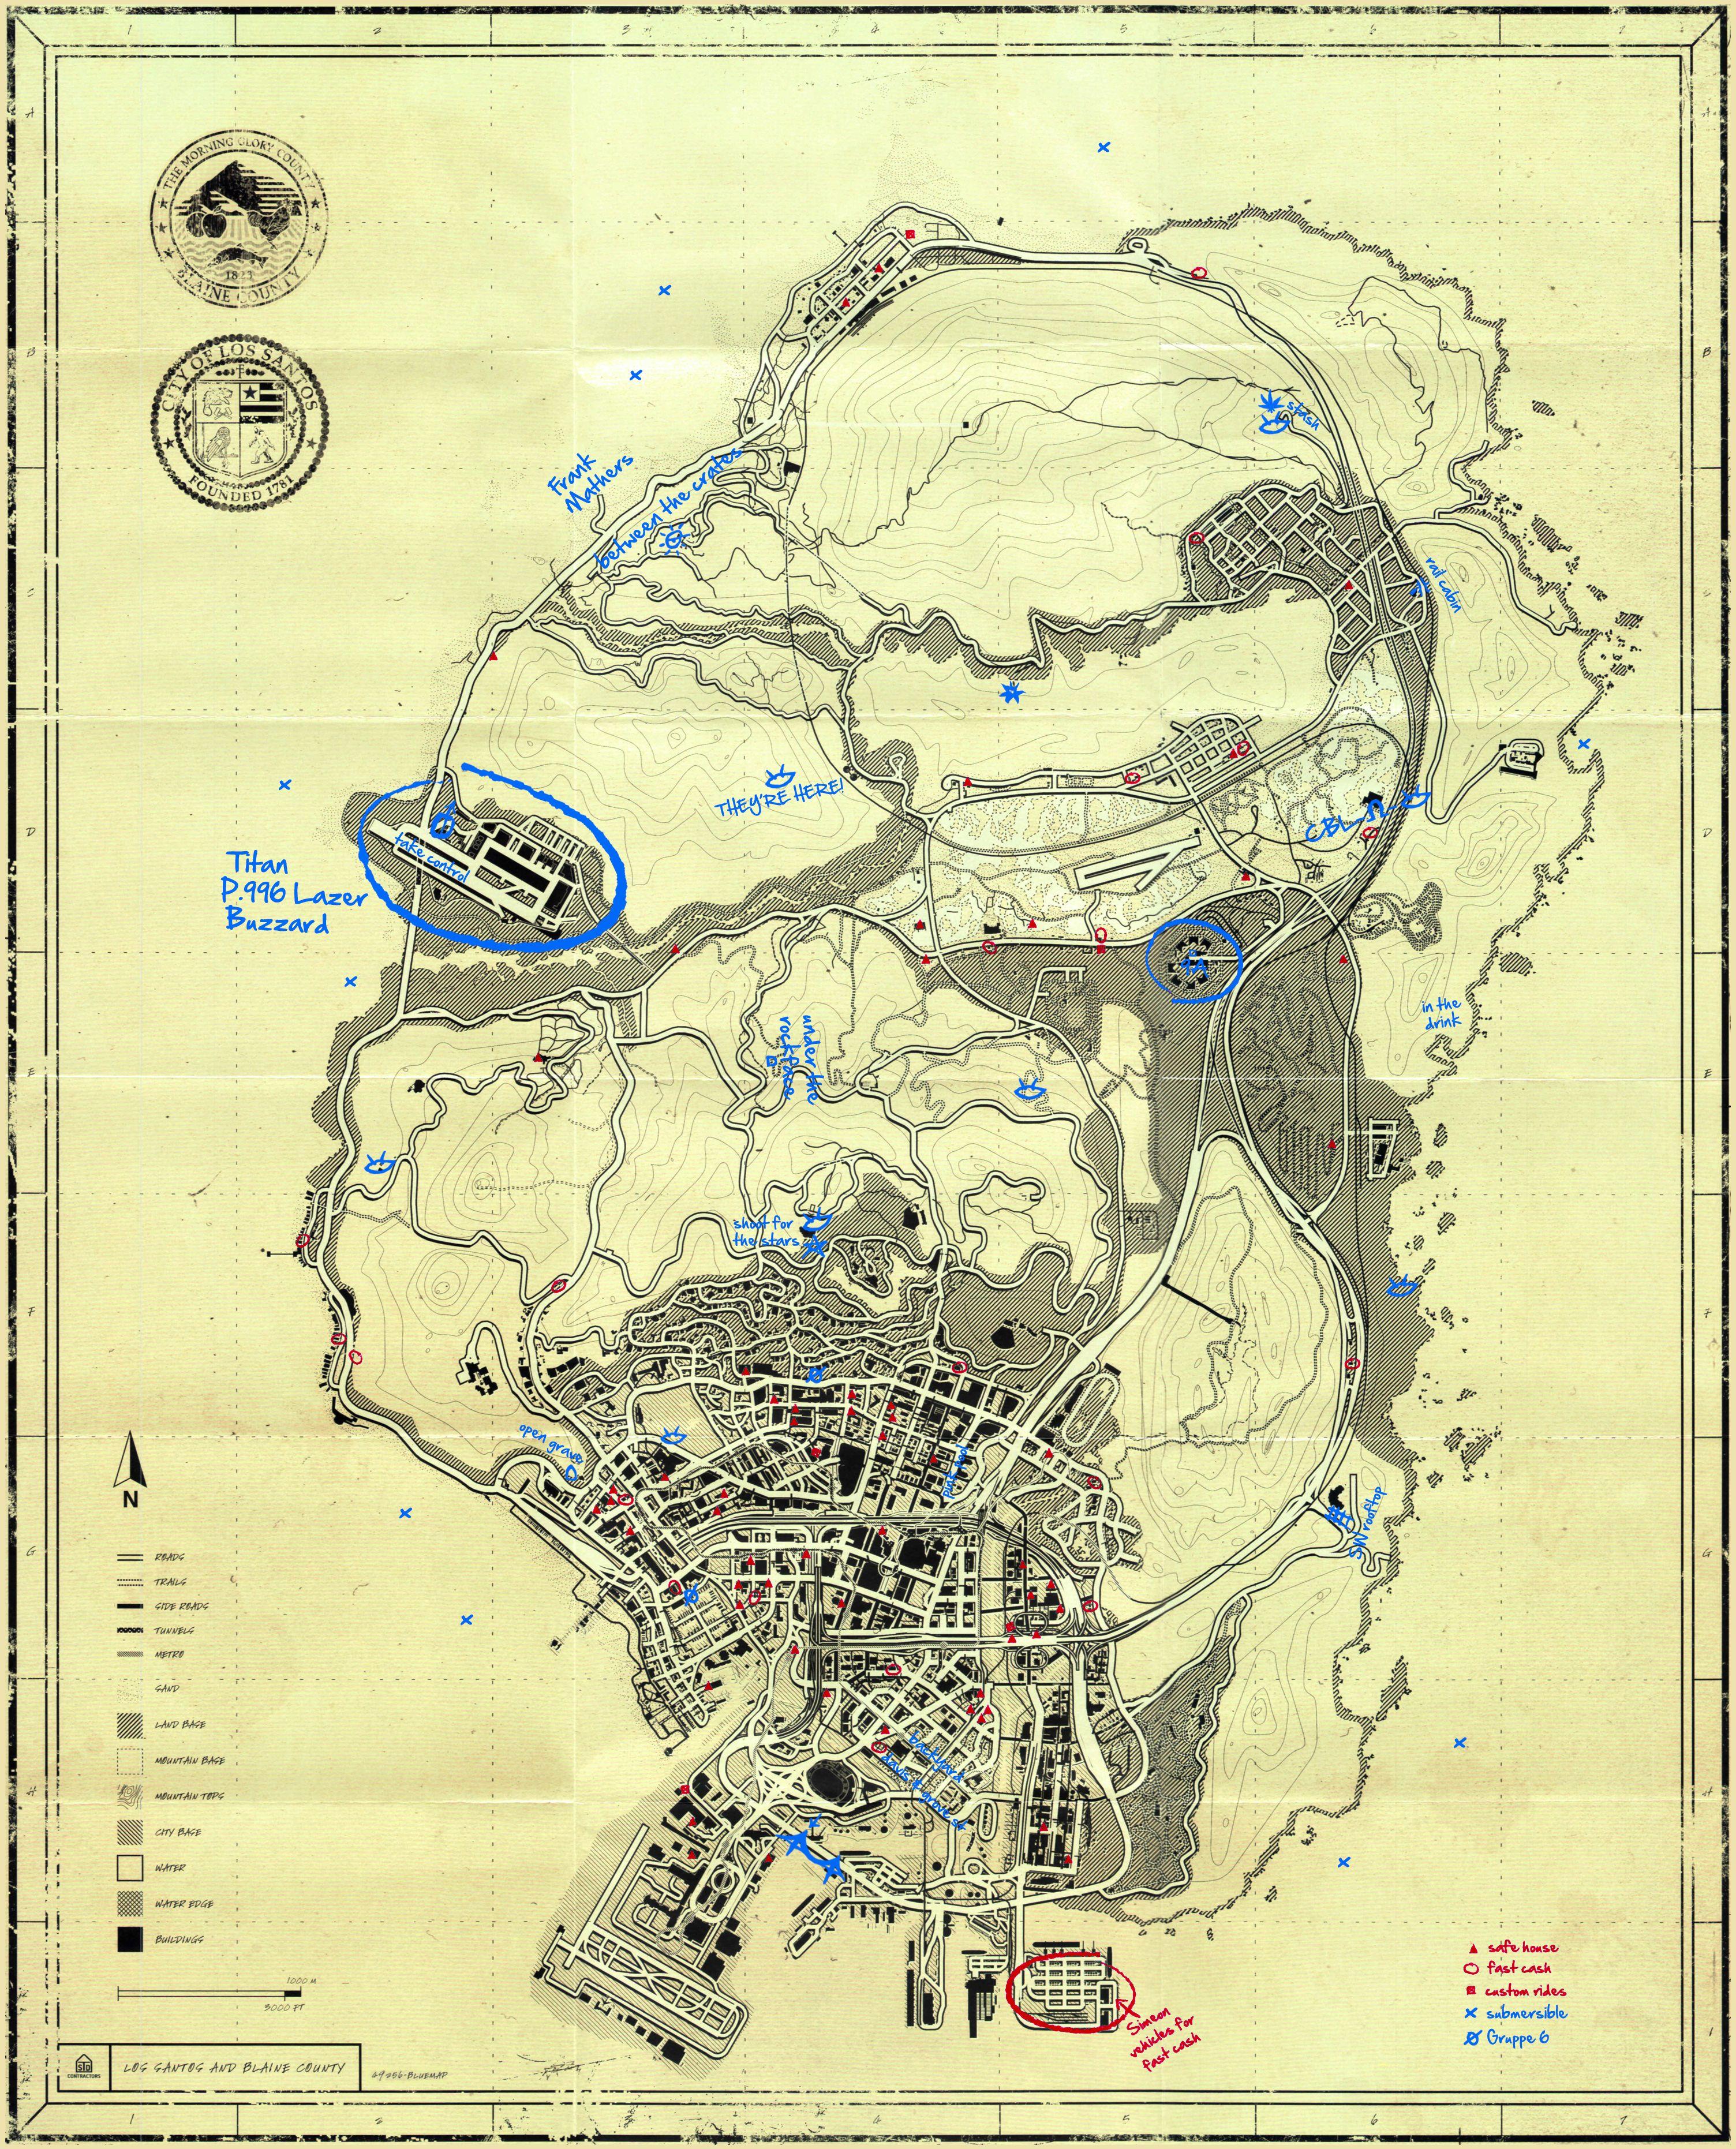 tpe blueprint map secrets gta 5 wiki guide ign - Gta V Secret Cars